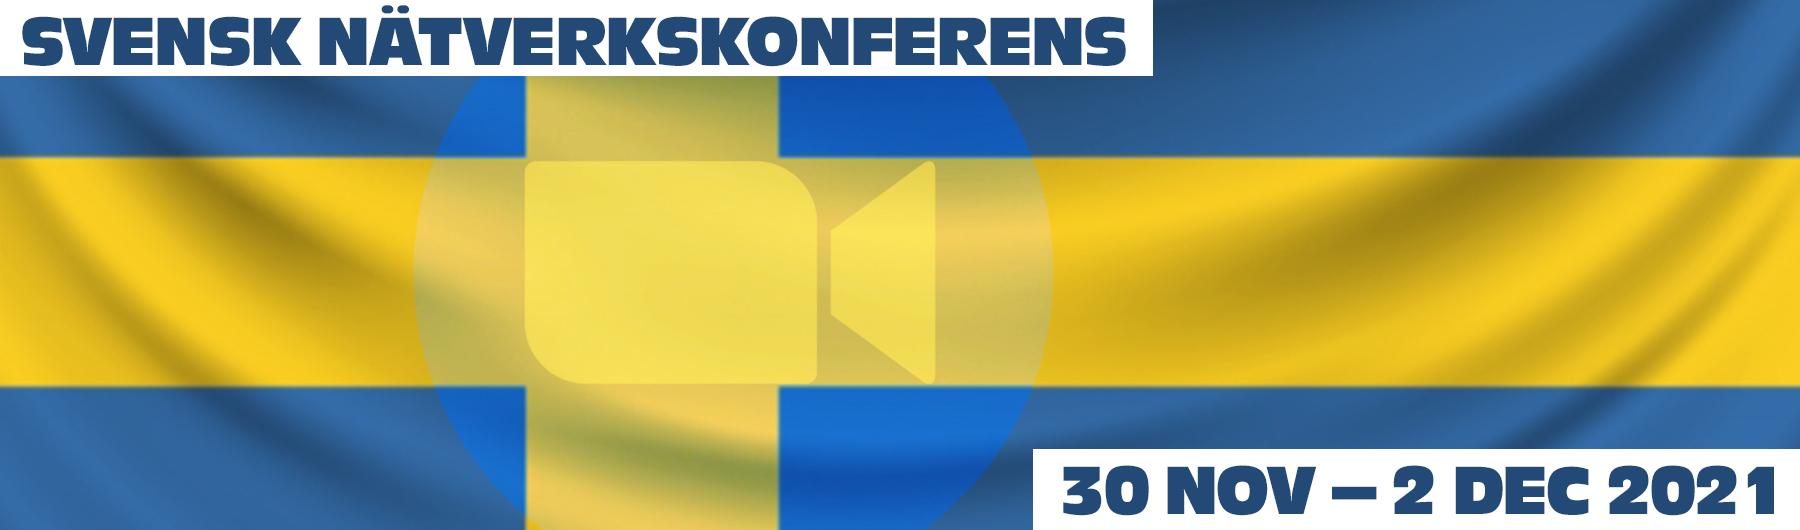 Signs of Safety Svensk Nätverkskonferens 2021